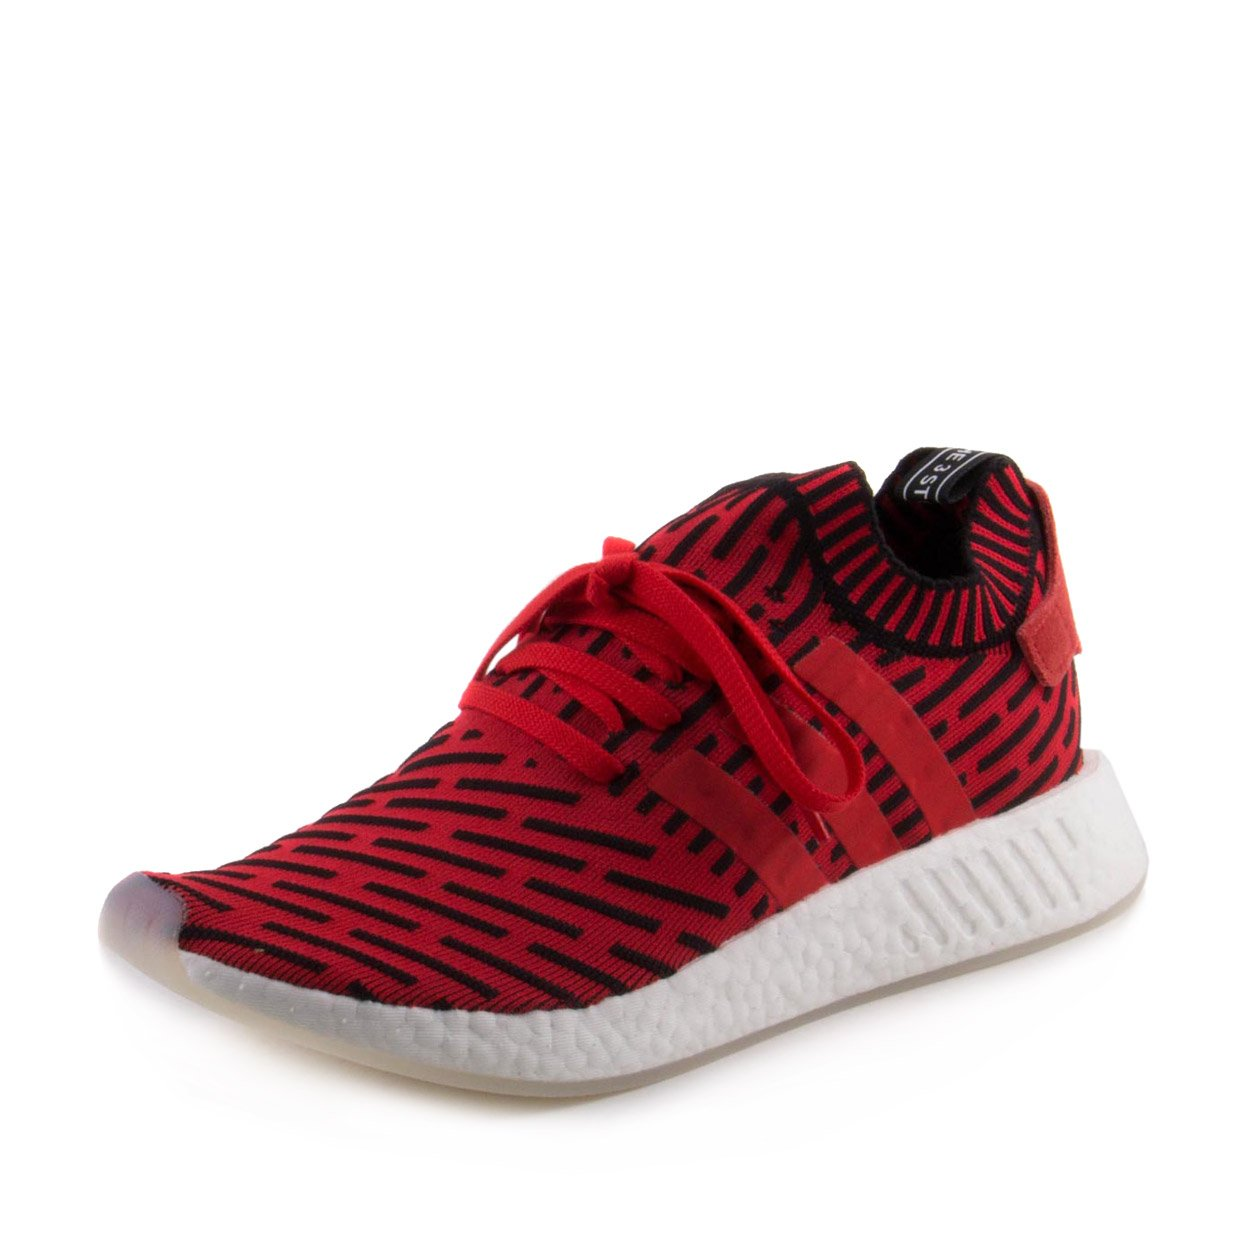 adidas Originals Men's NMD_r2 Pk Sneaker